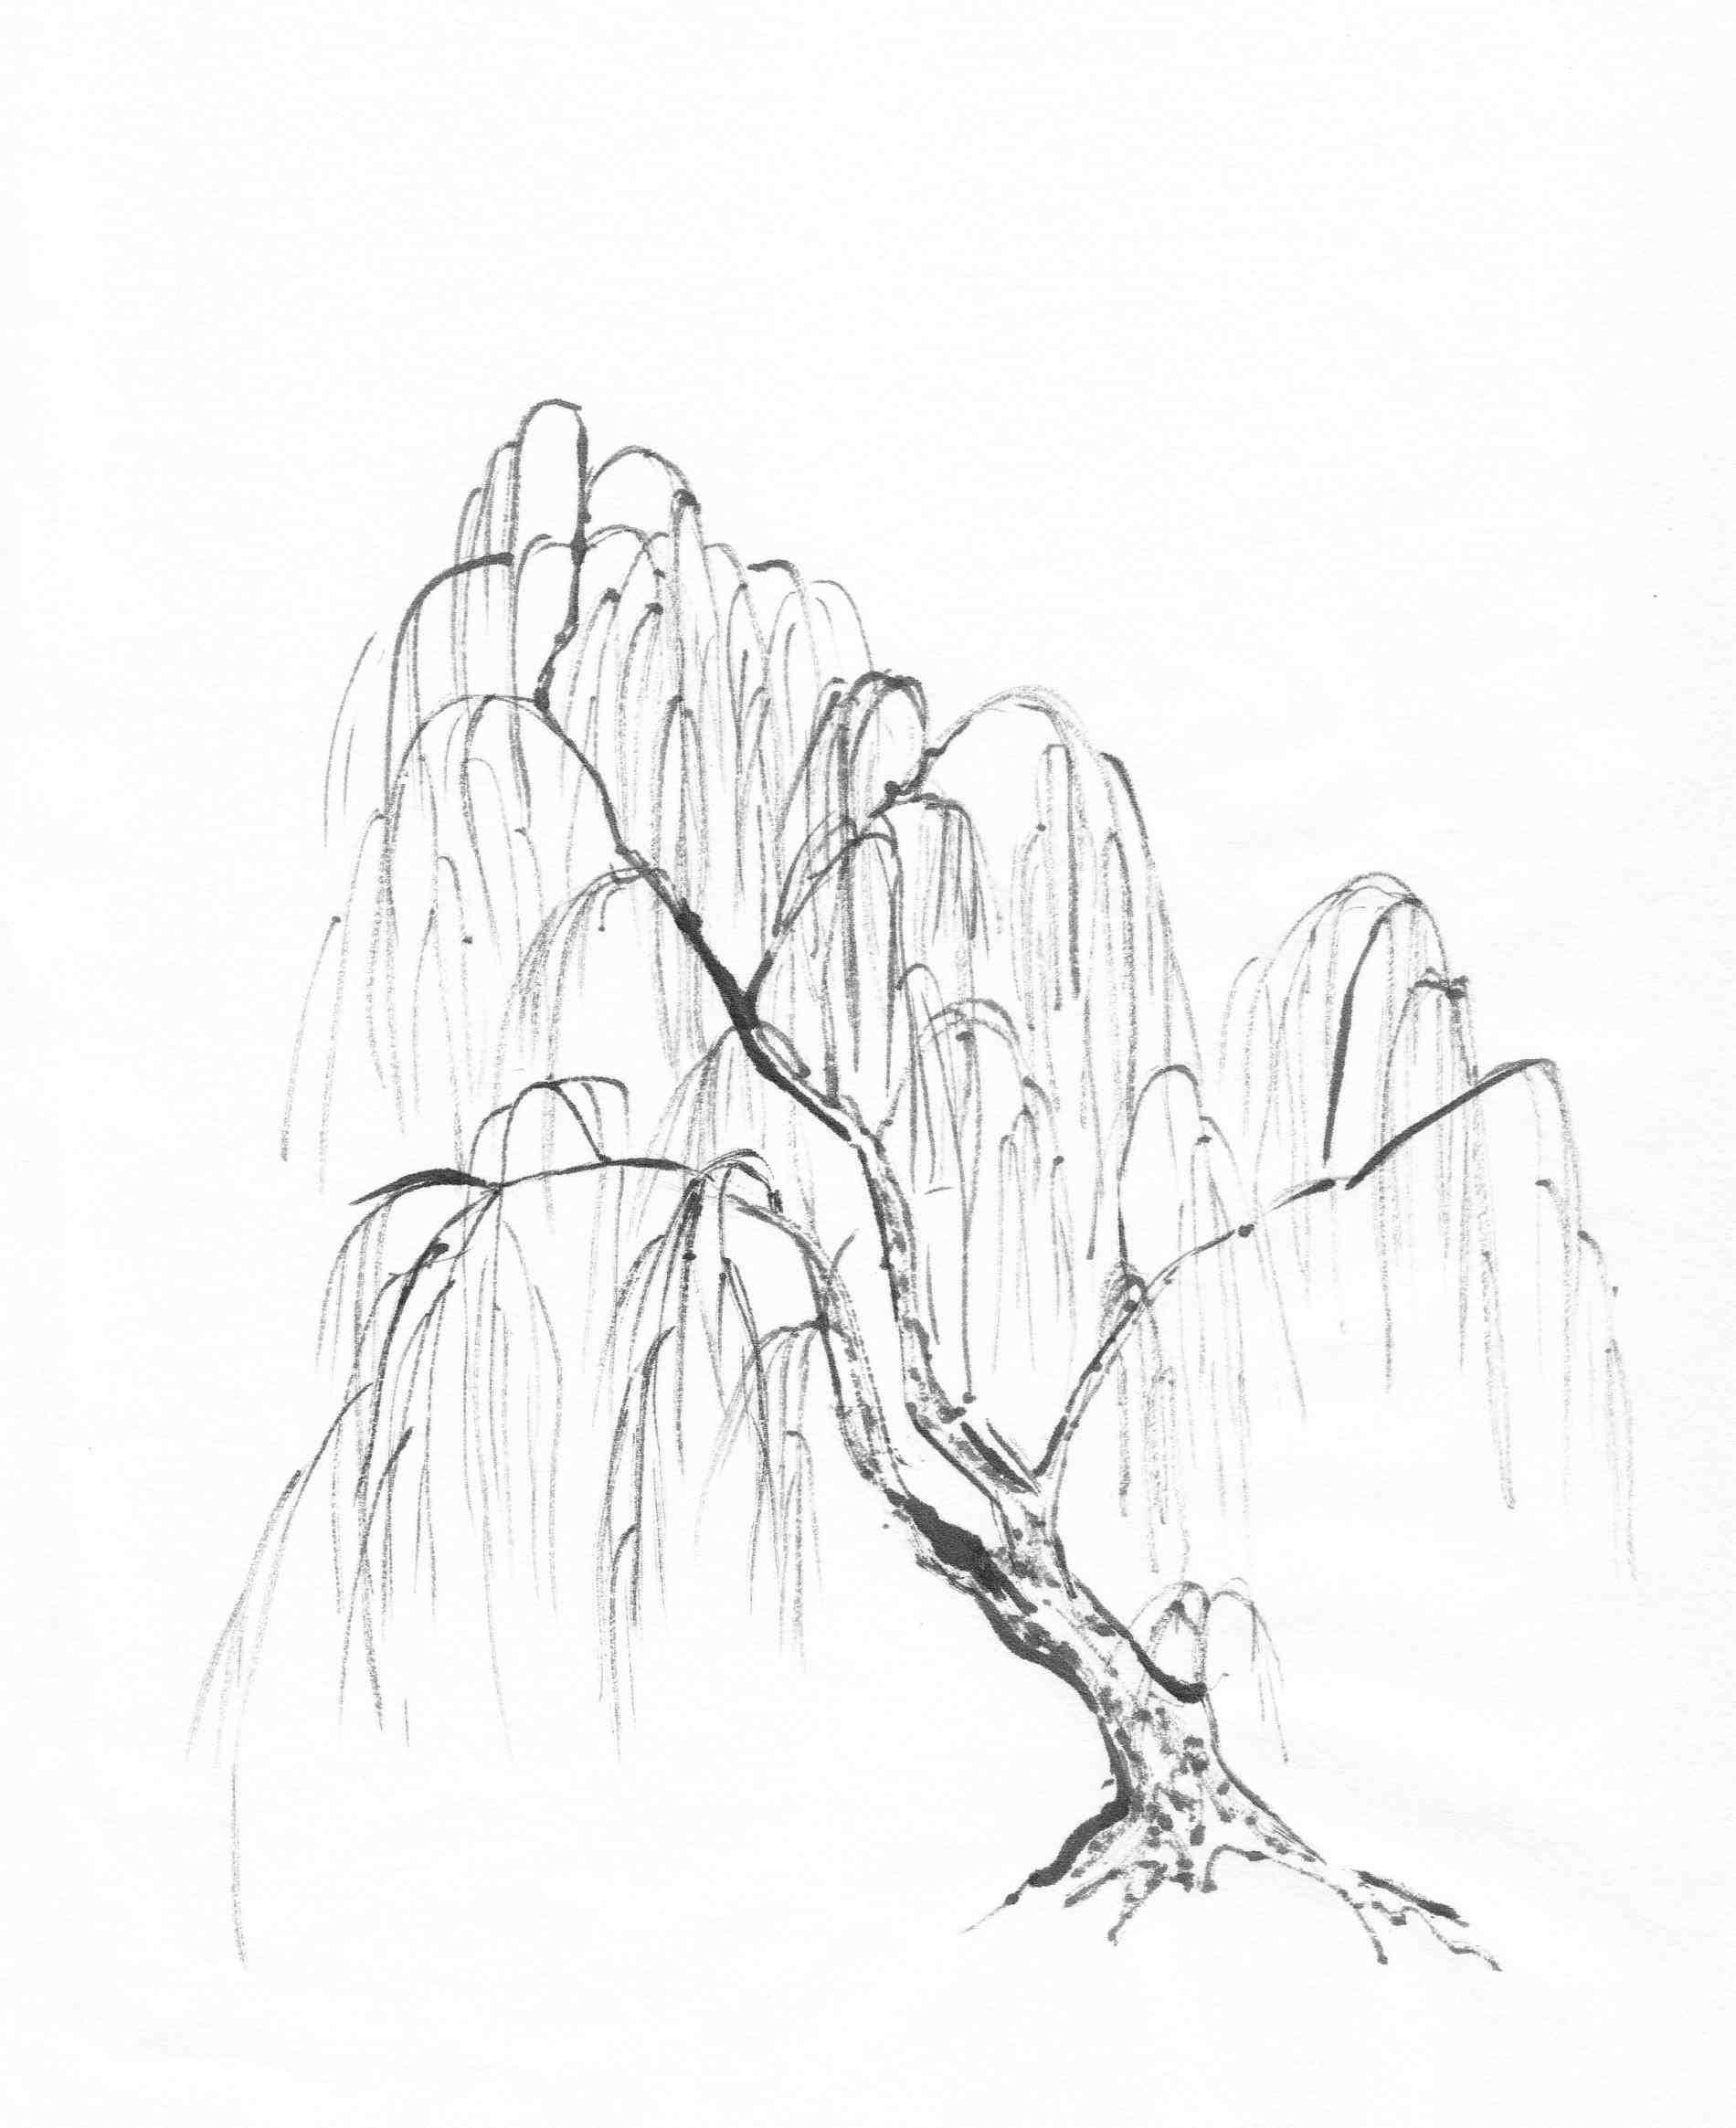 Watercolor Weeping Willow Tree Tattoo Ngorong Club Tattoo Art